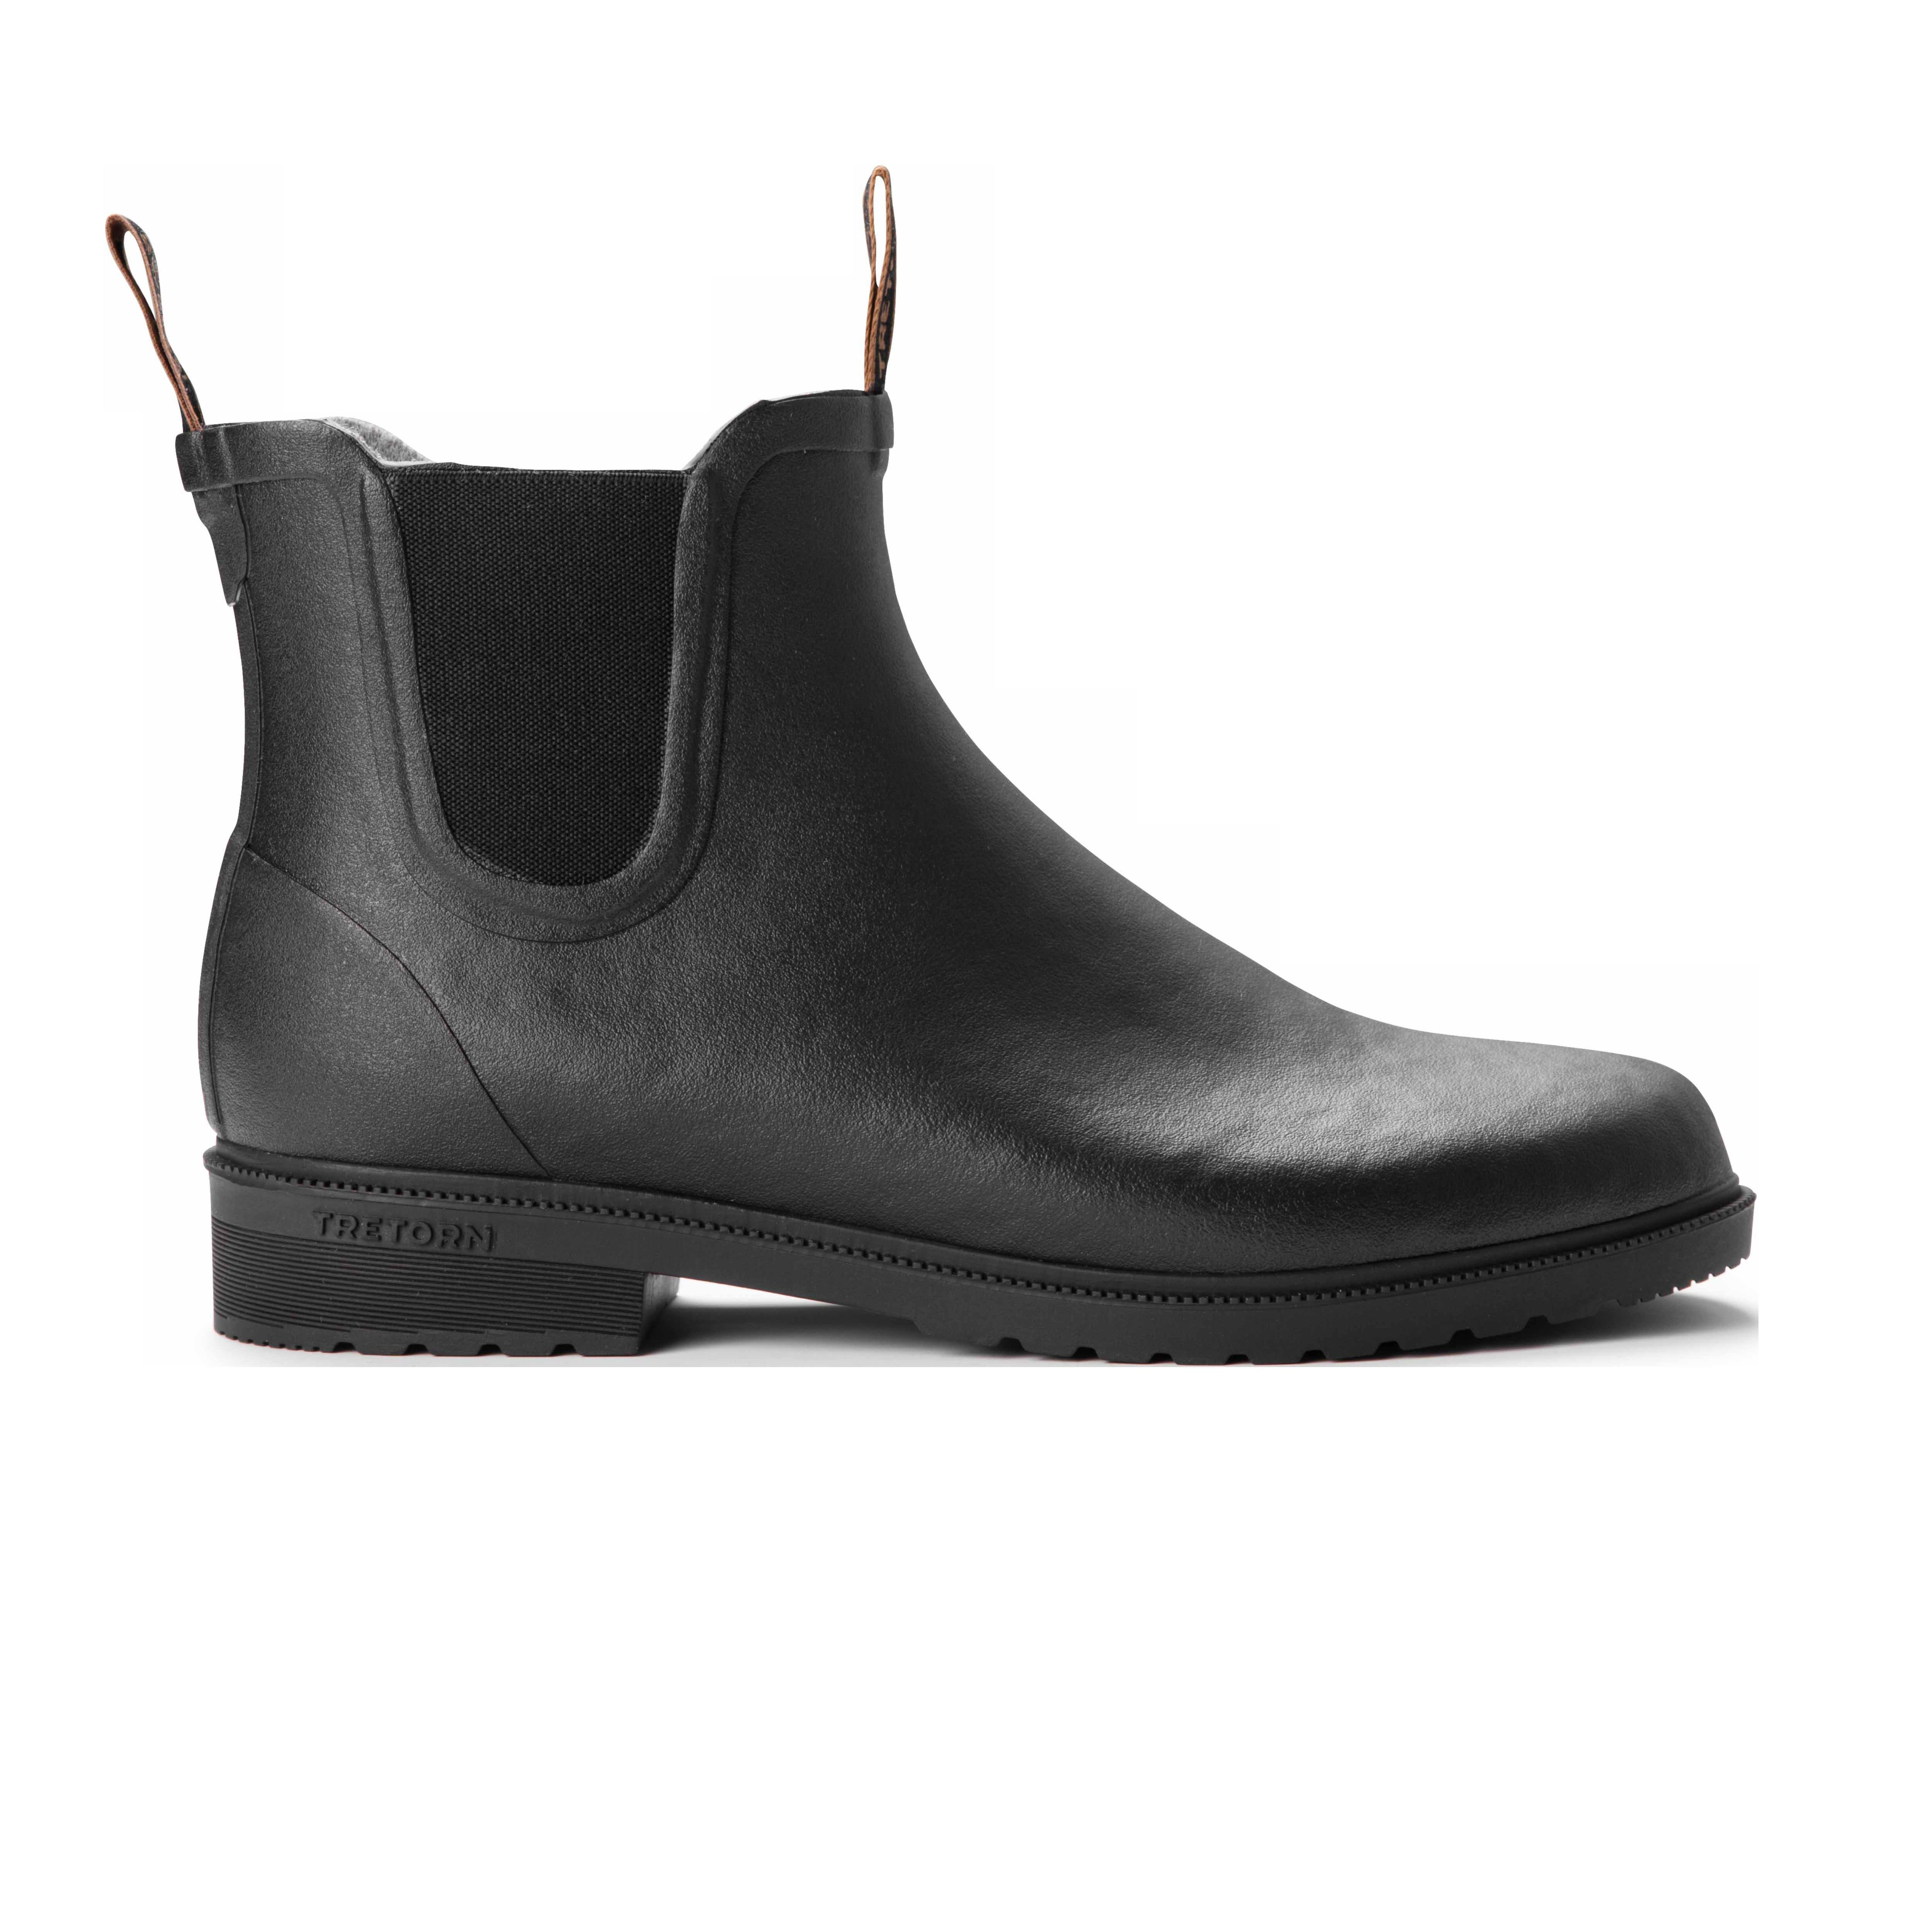 Tretorn Black Rubber Wool Lined Chelsea Boots Side